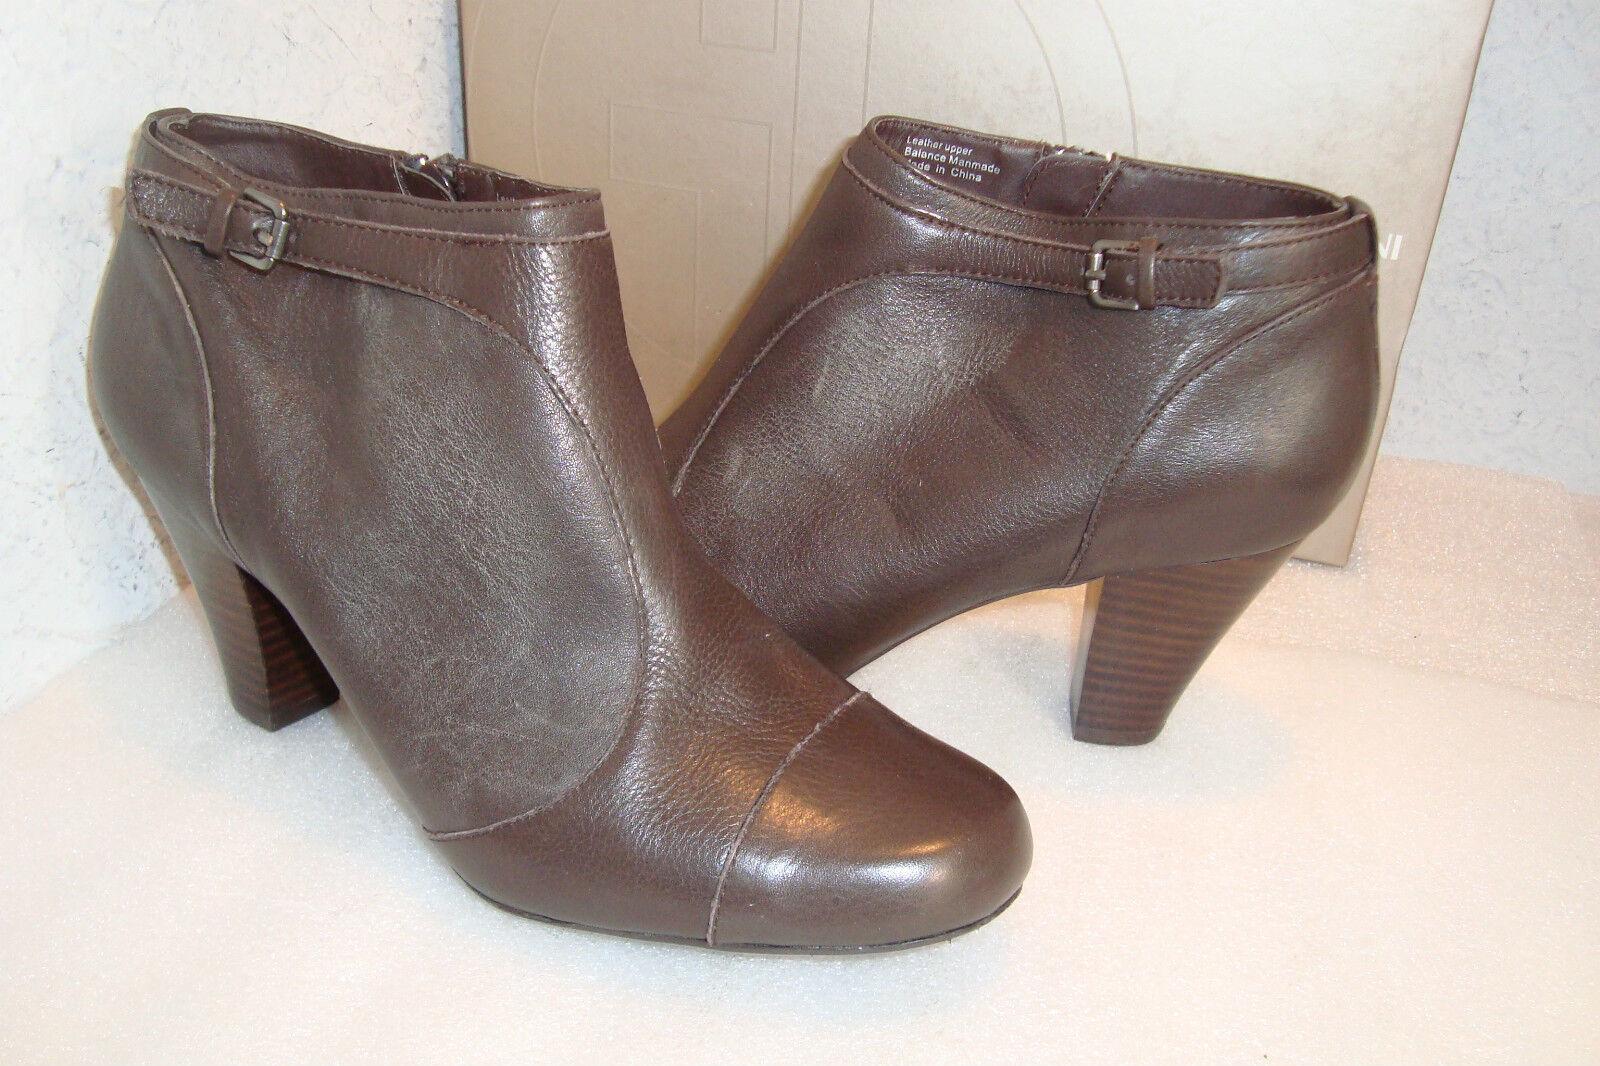 Giani Bernini Damenschuhe NWB Lorca Braun Ankle Stiefel Schuhes 9 Medium